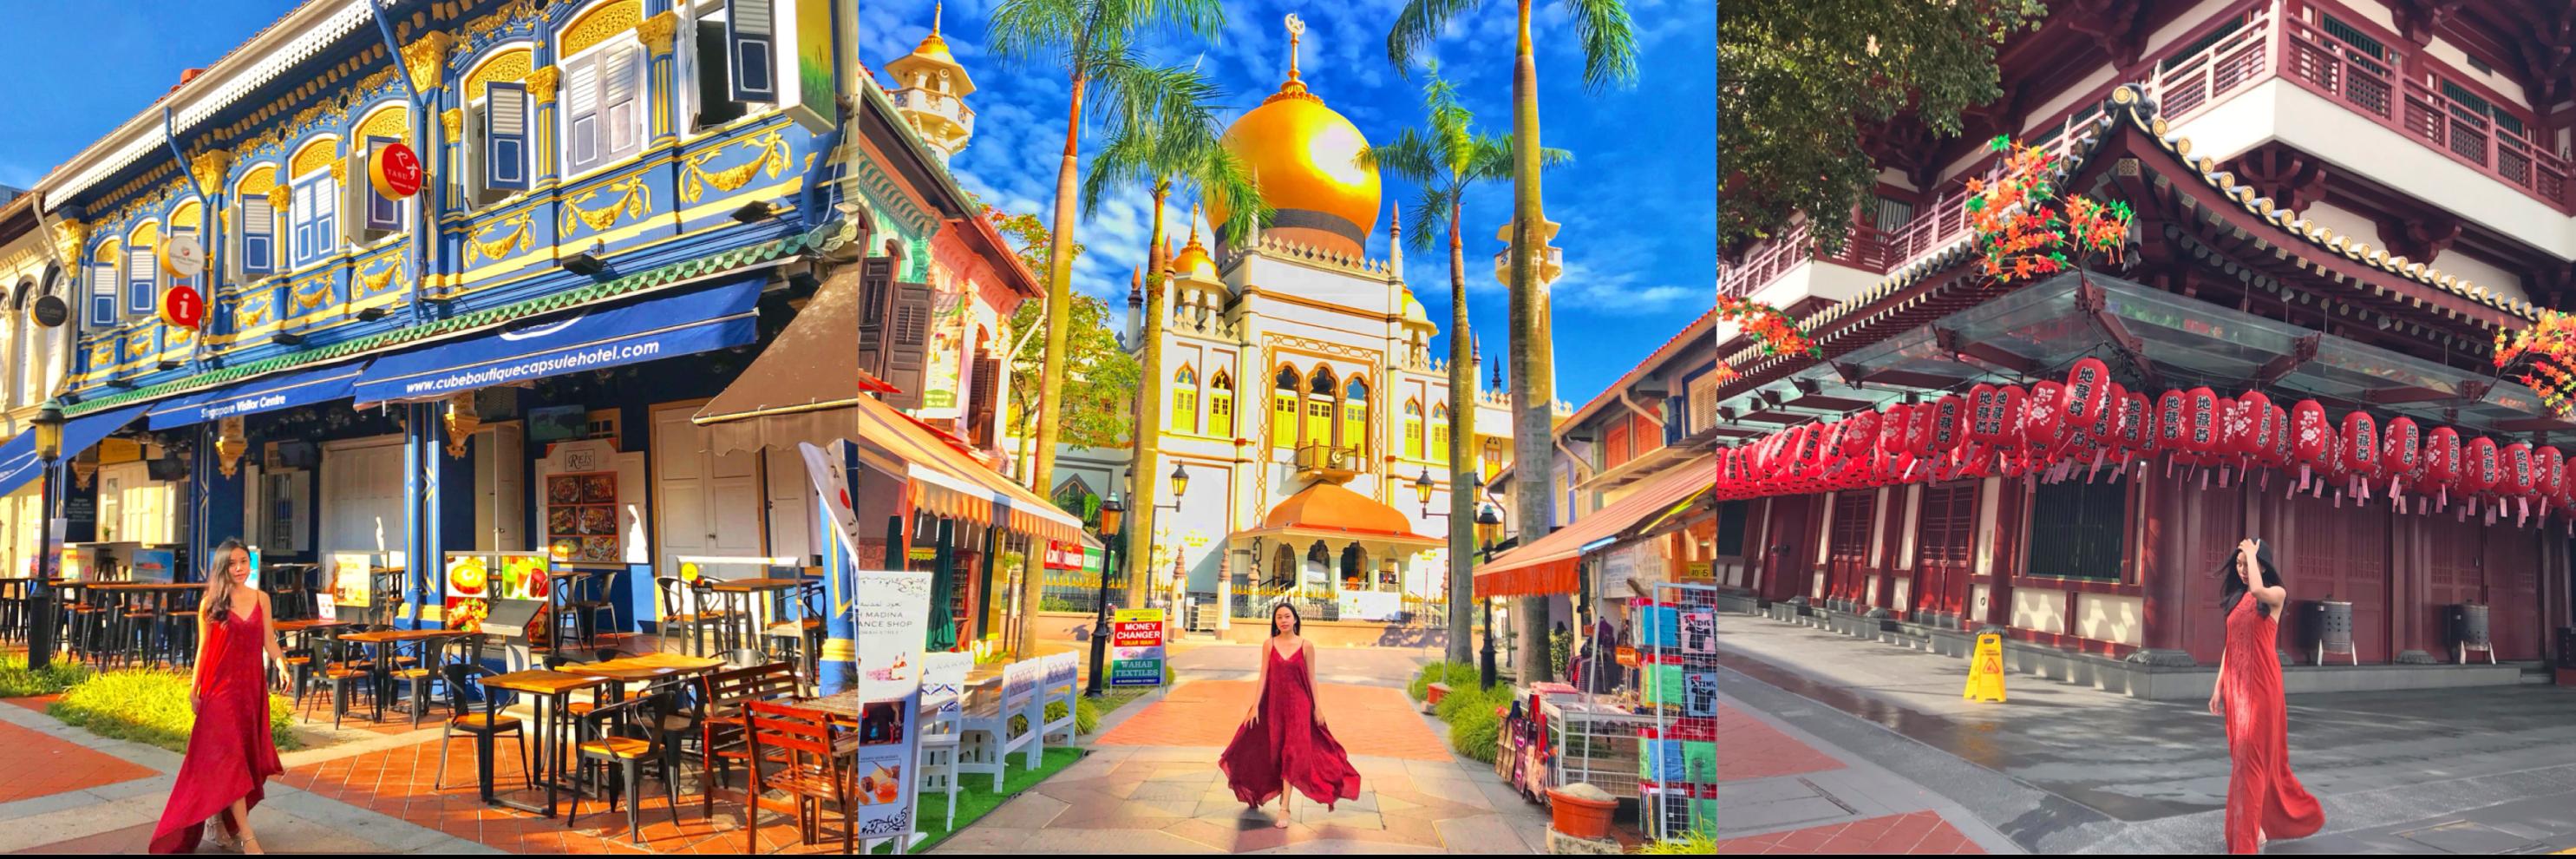 https://gody.vn/blog/hothikieutrinh8470/post/singapore-day-mau-sac-trong-toi-1493